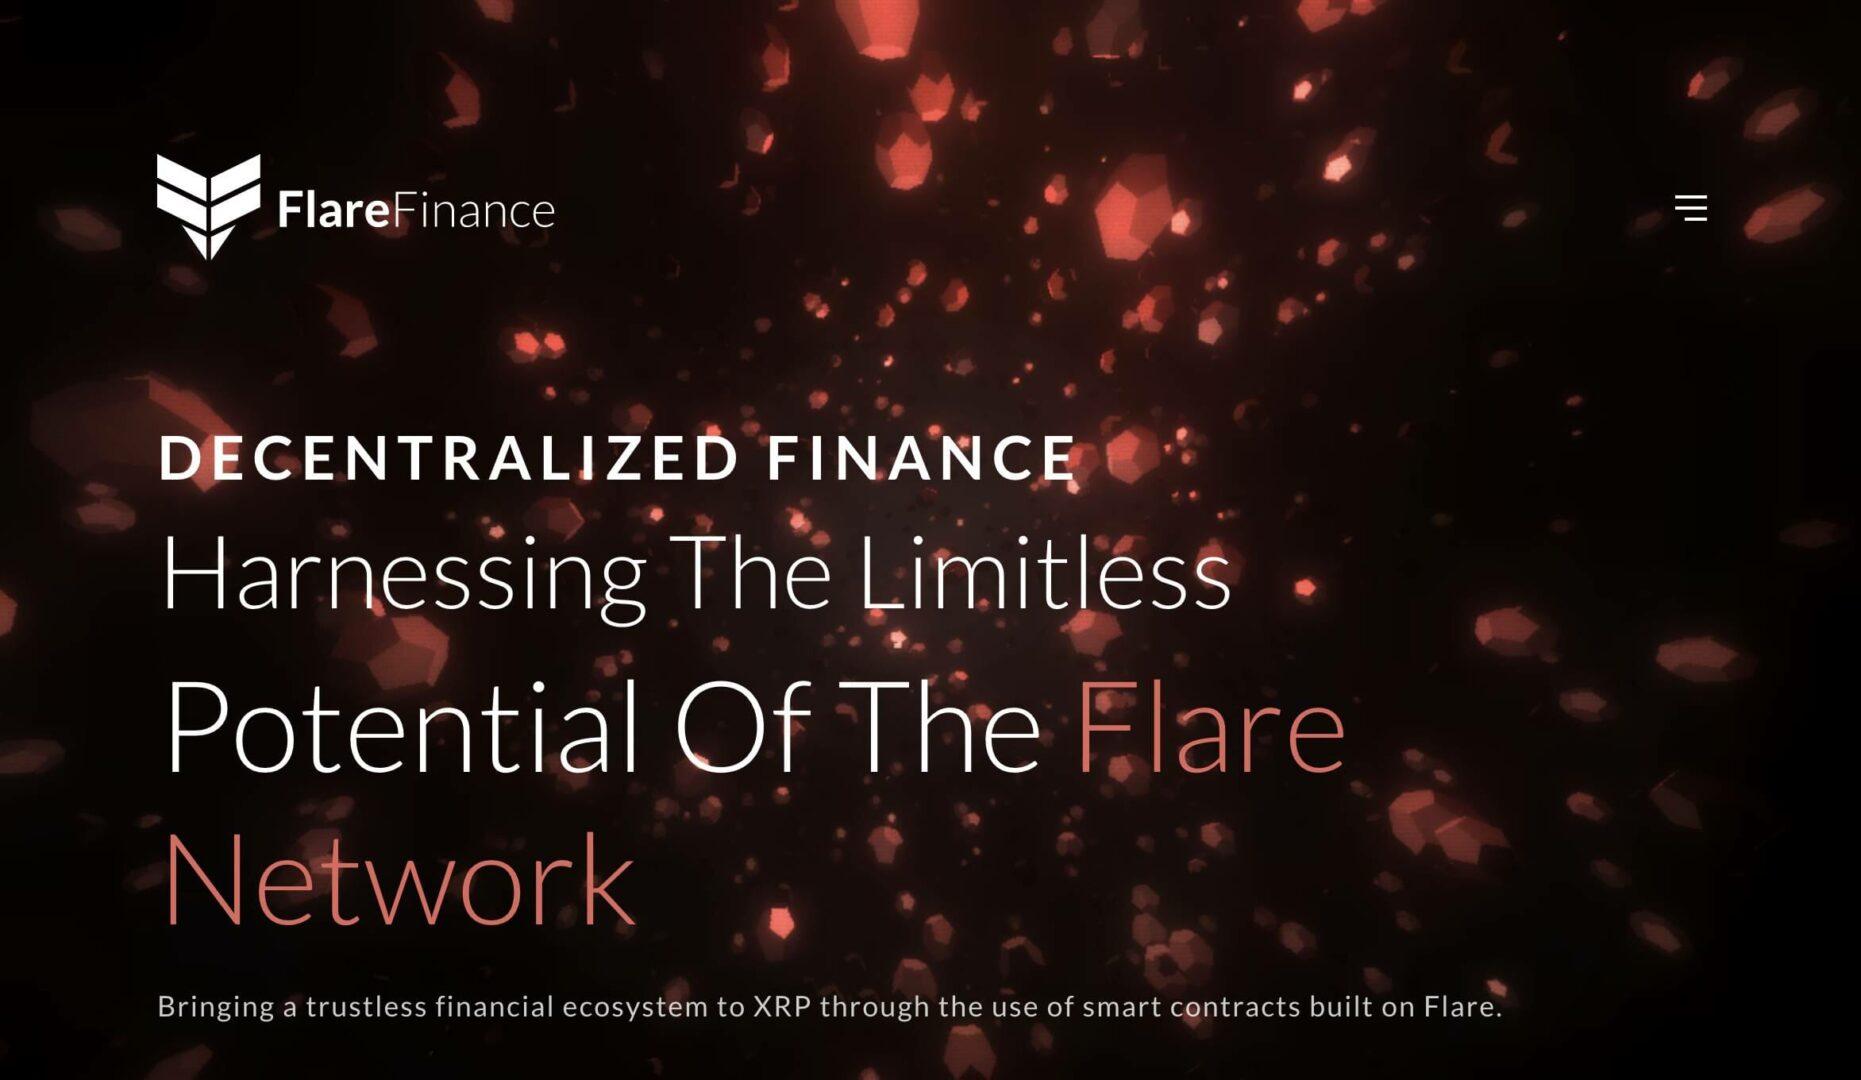 Flare Finance